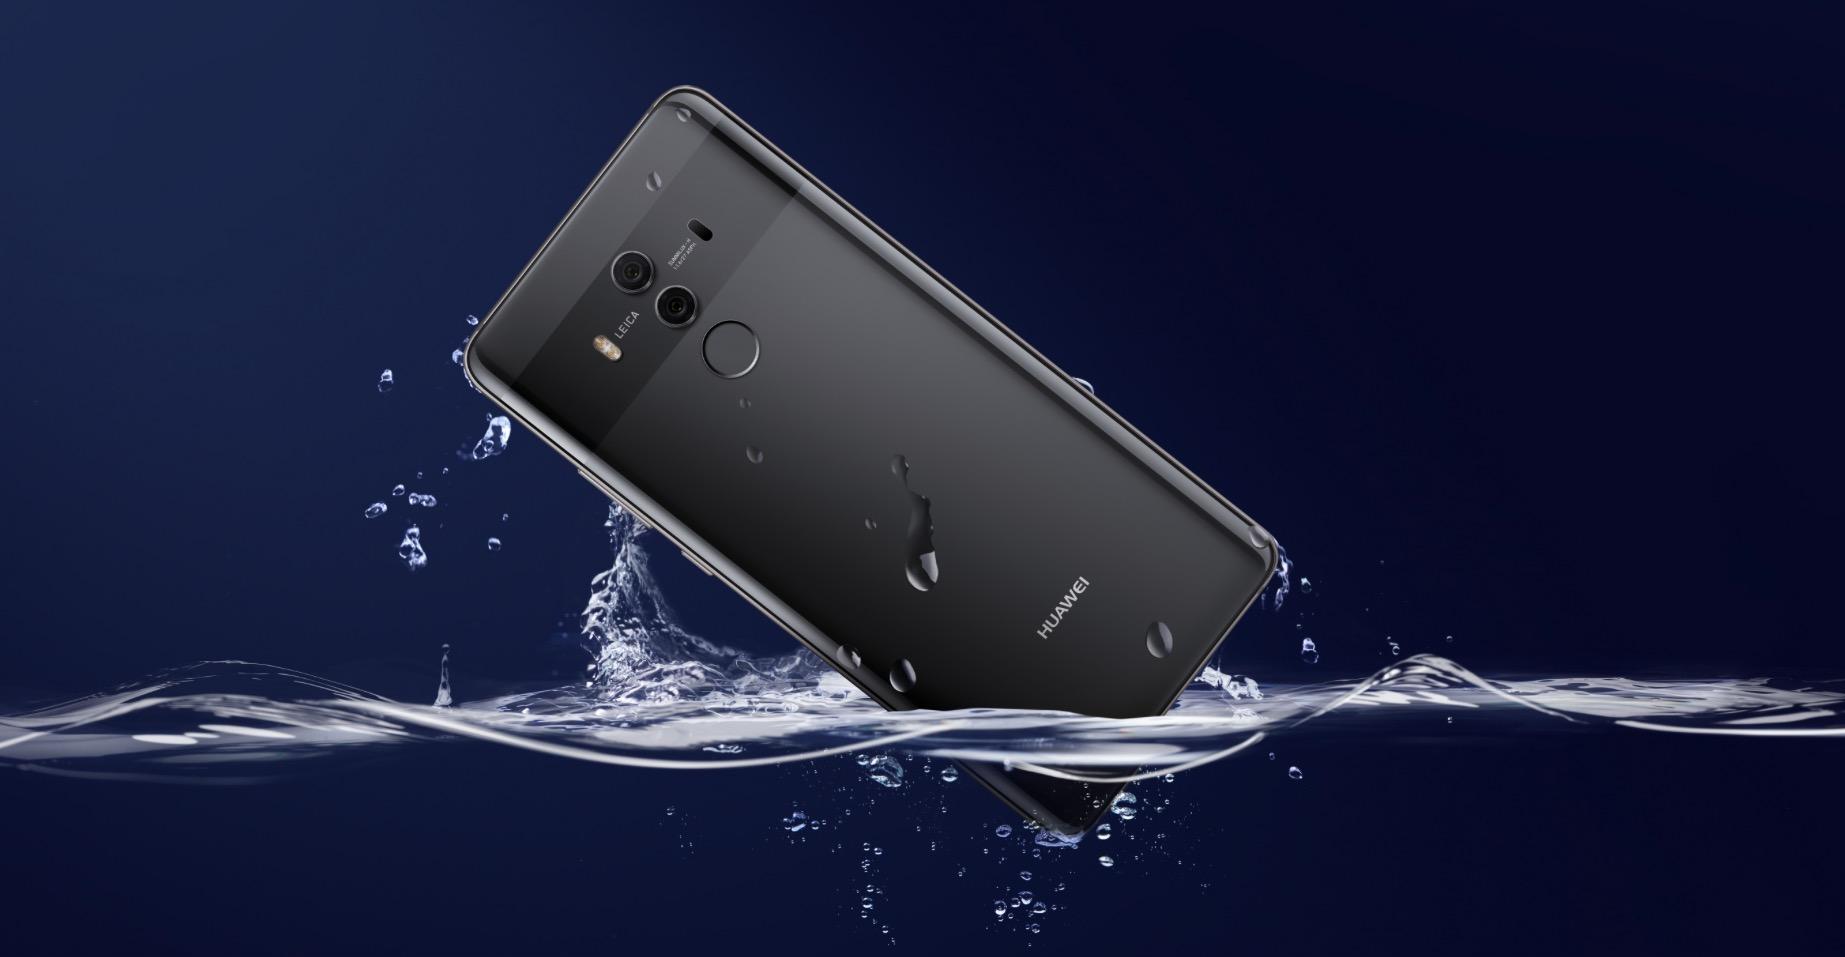 Huawei Mate 10 Pro water